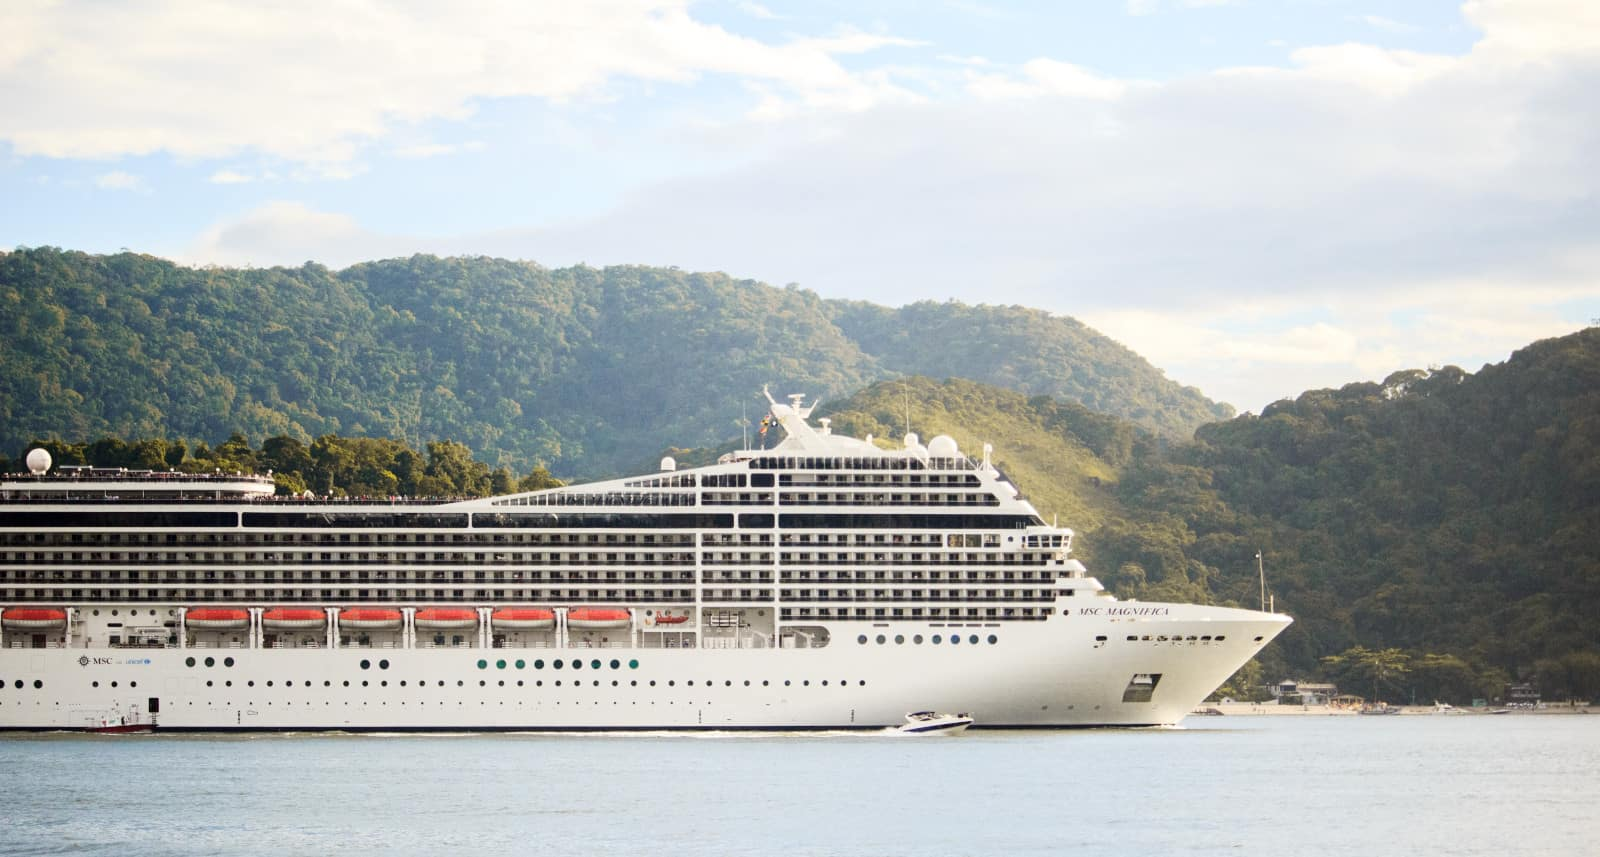 Cruise-ship-trees-sky-water-white